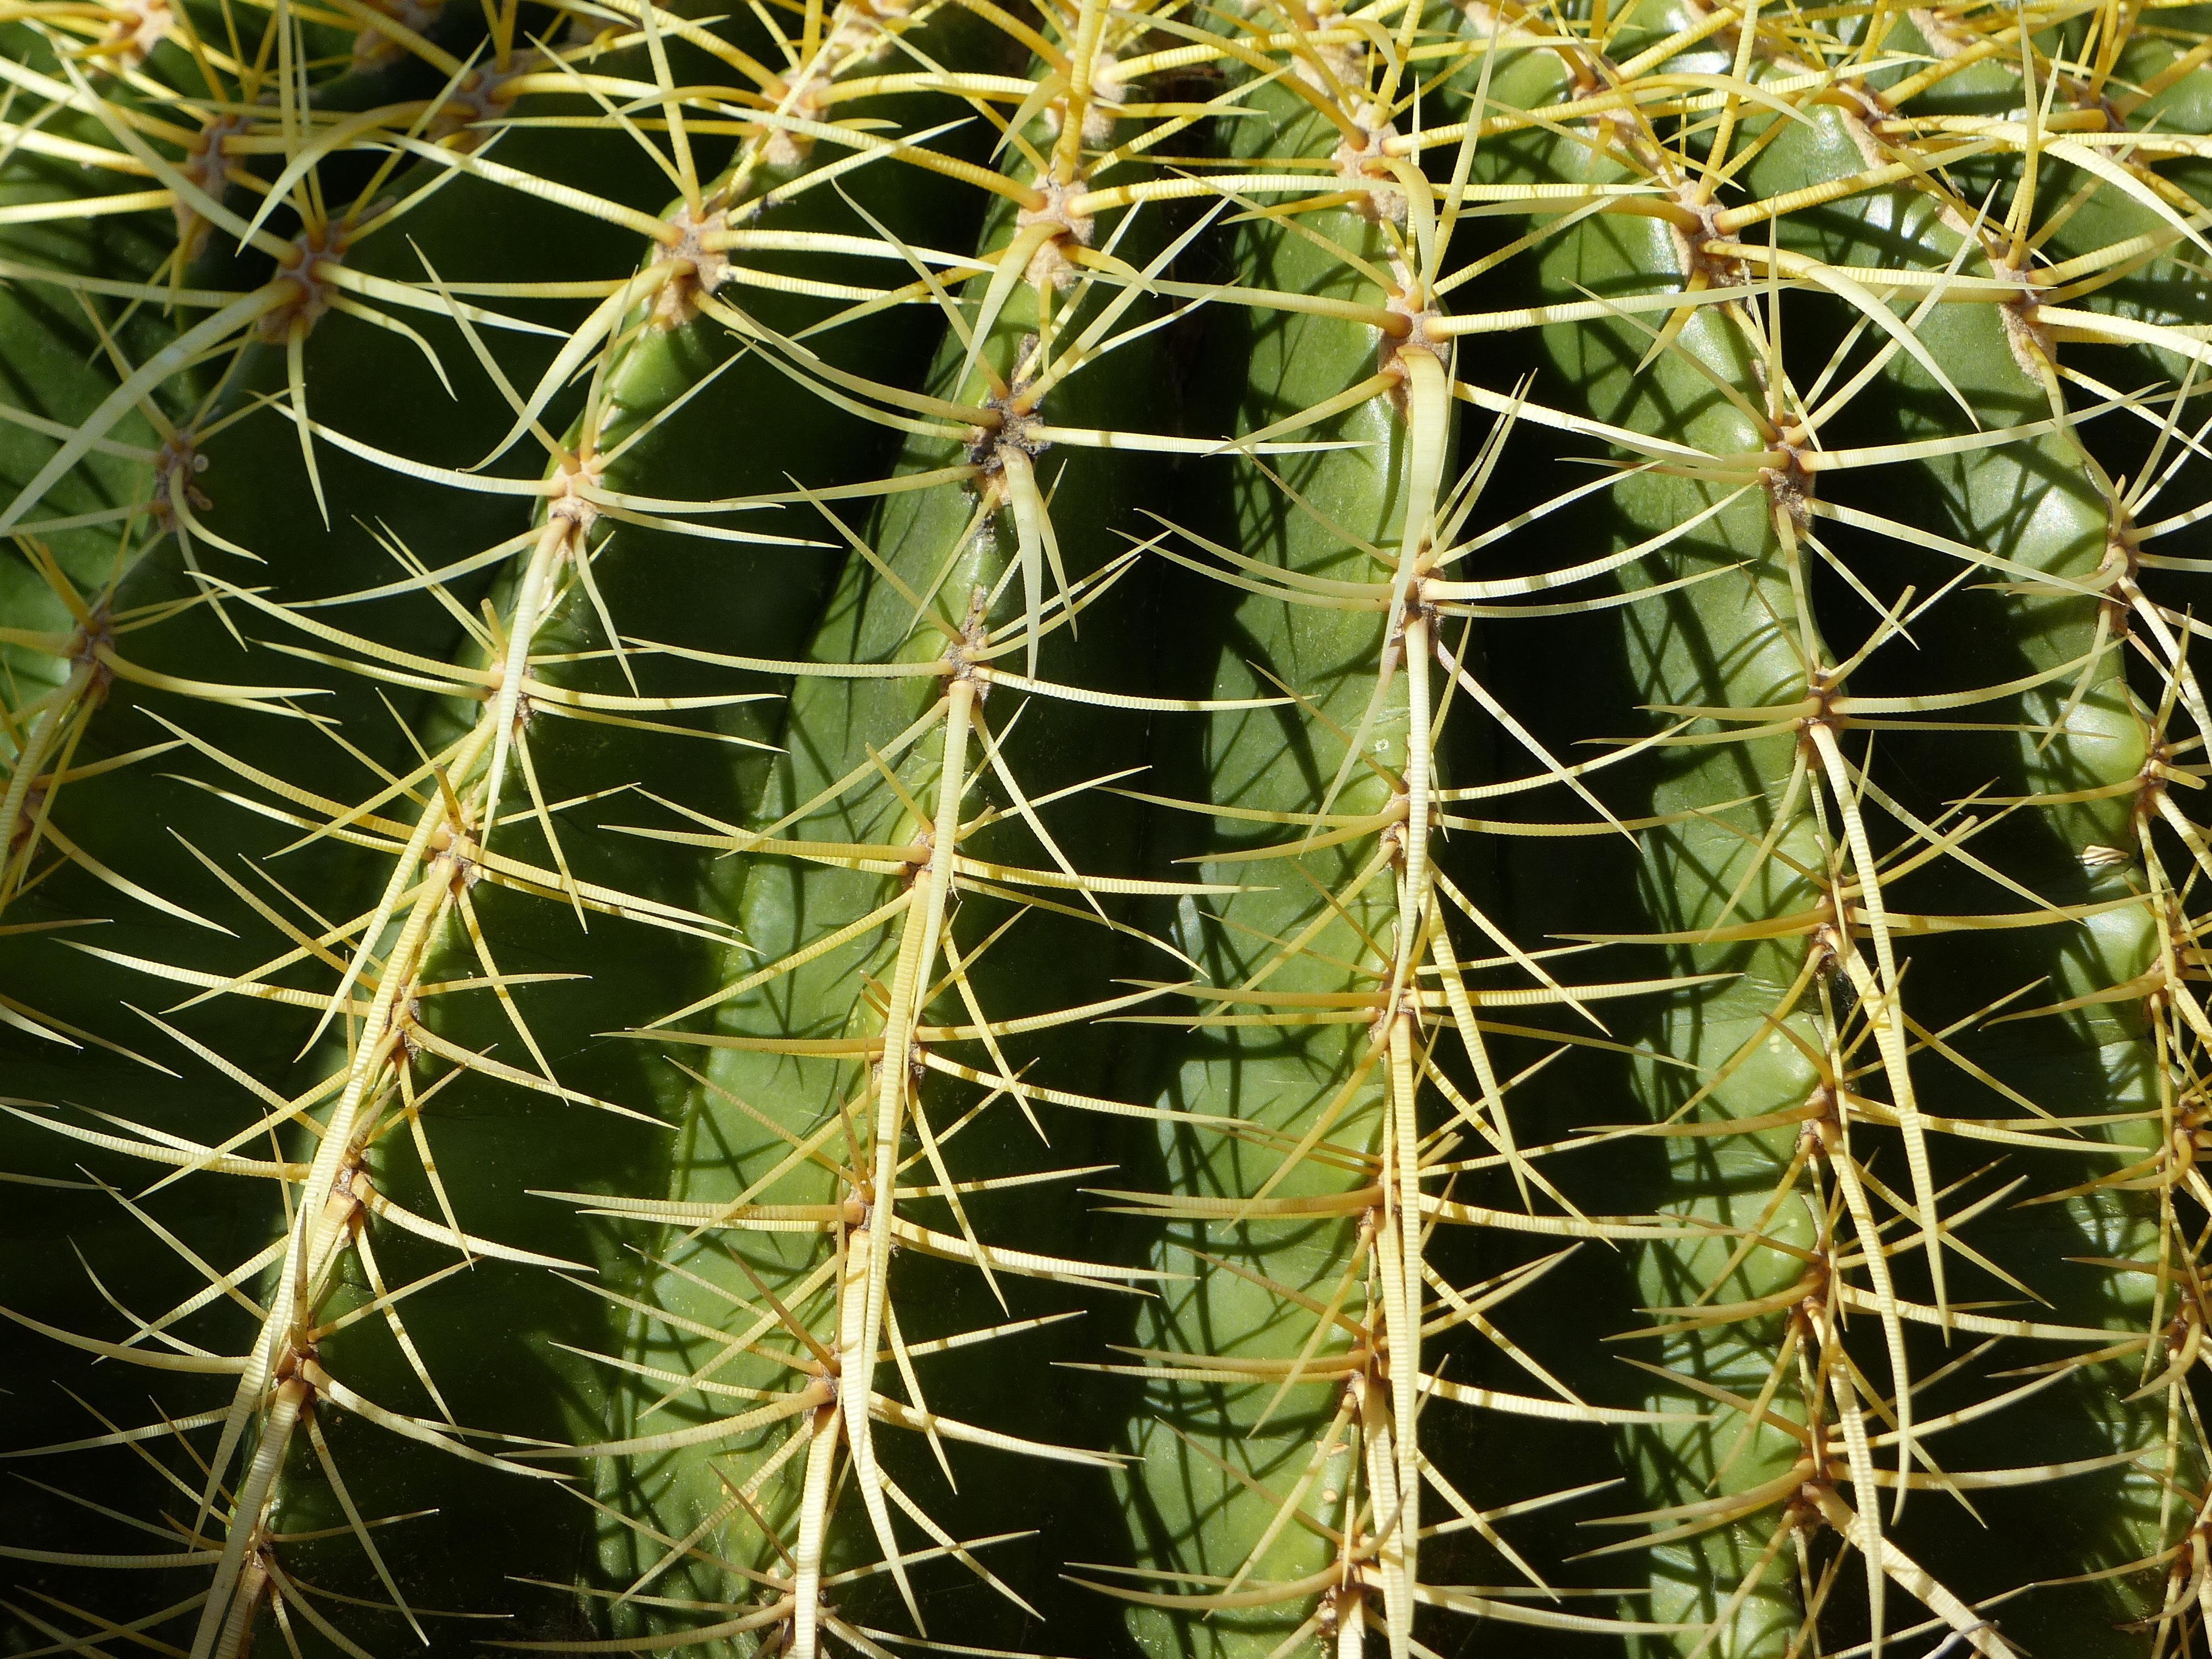 images gratuites la nature cactus d sert pine vert naturel botanique flore v g tation. Black Bedroom Furniture Sets. Home Design Ideas